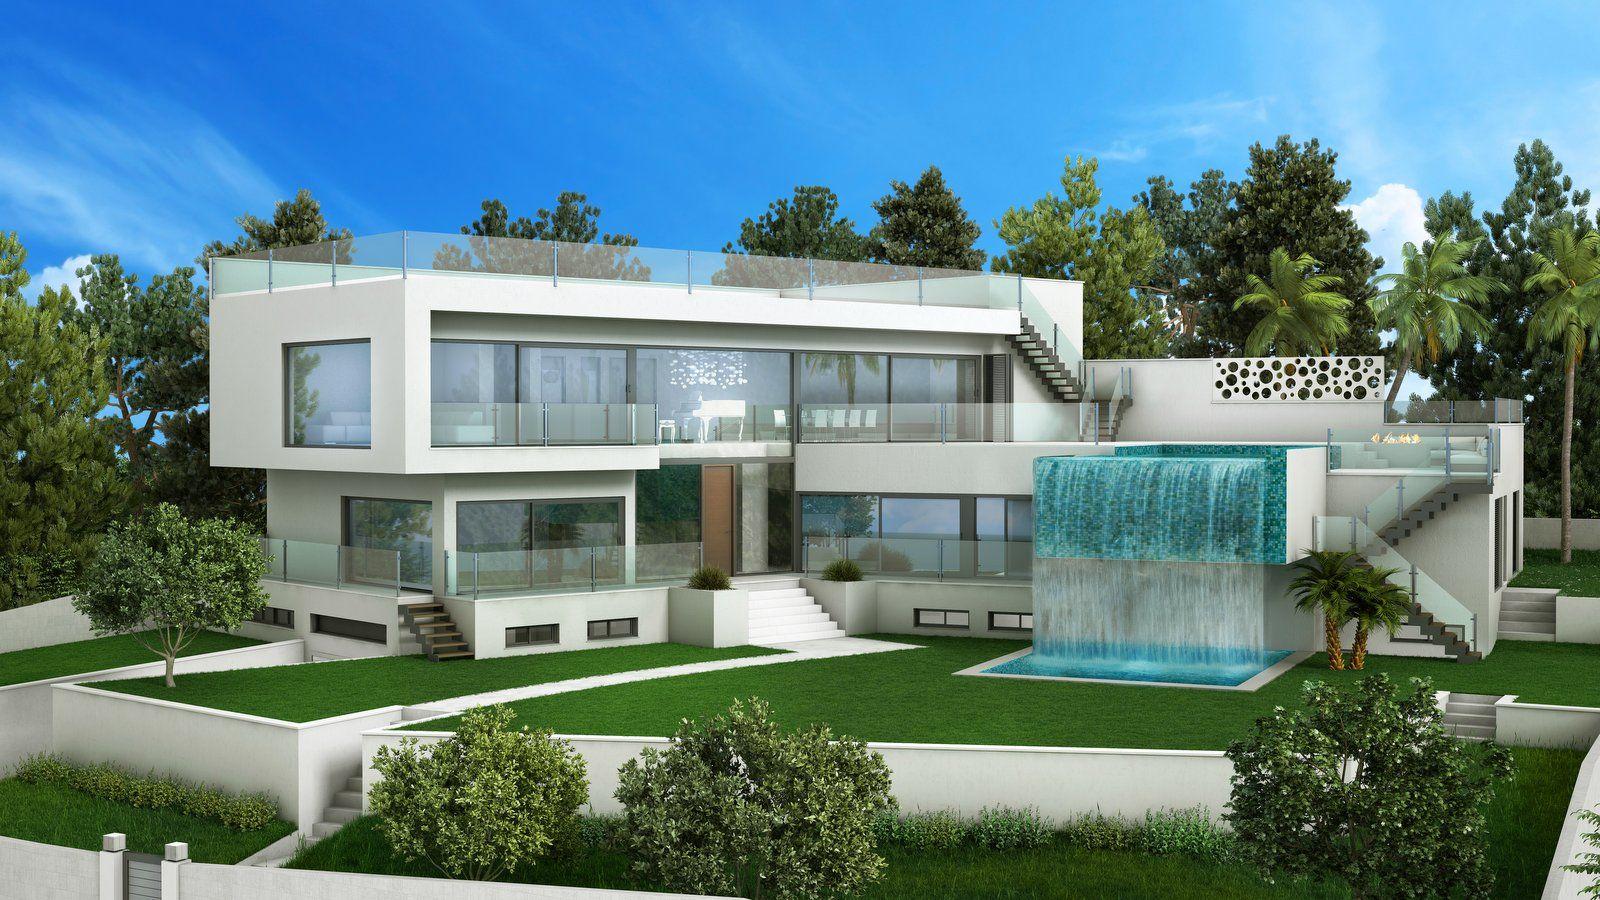 Neu : moderne Luxusvilla in Nova Santa Ponsa, Mallorca http://www.casanova-immobilienmallorca.de/de/villa-haus/2511526/Villa-Mallorca--Neubauprojekt-einer-exclusiven-Meerblick-Villa